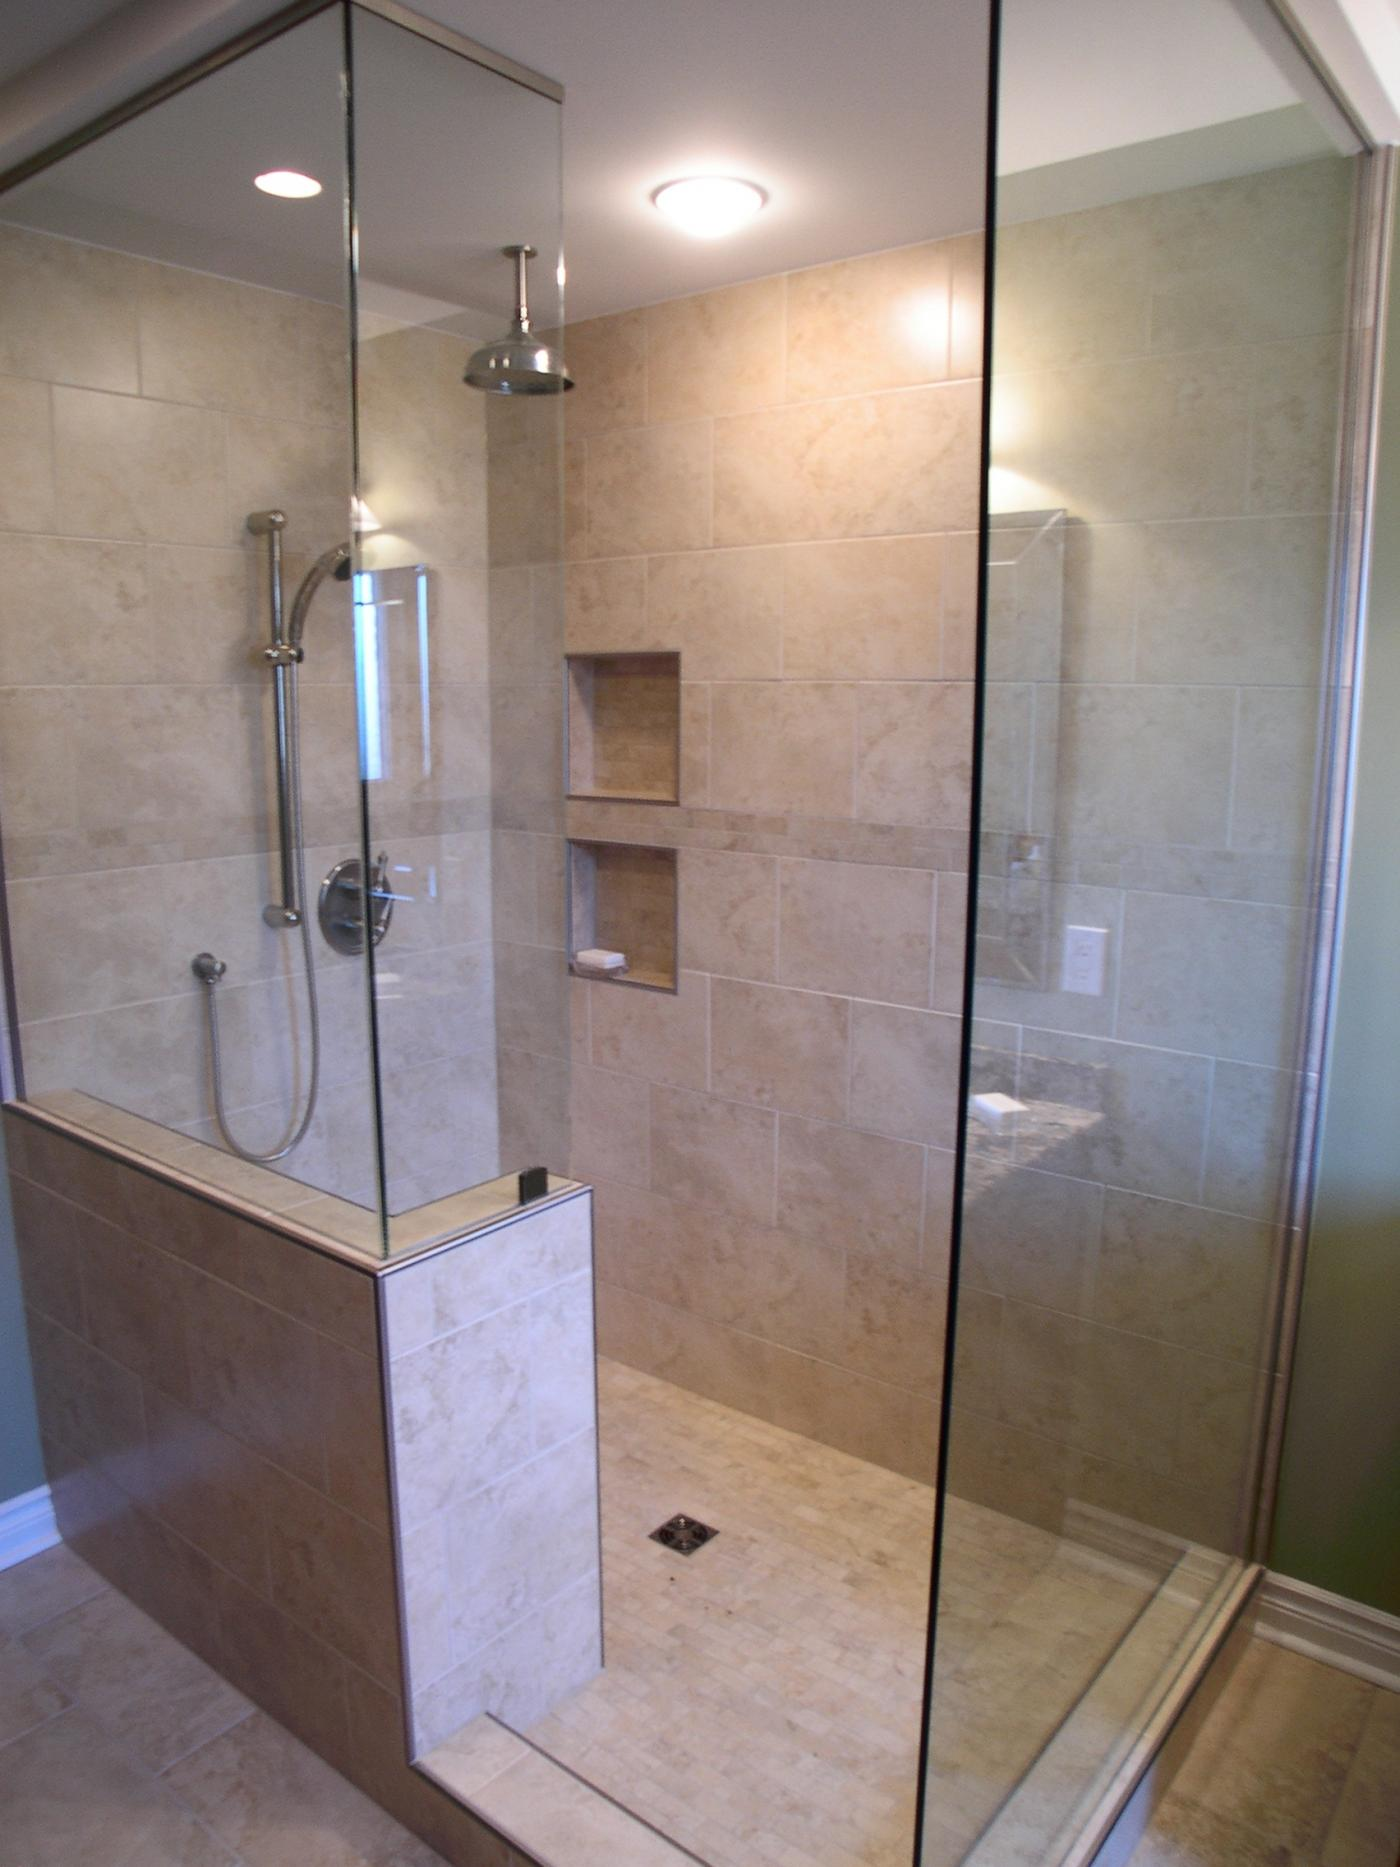 Walk In Shower Ideas - Remodeling - Contractor Talk